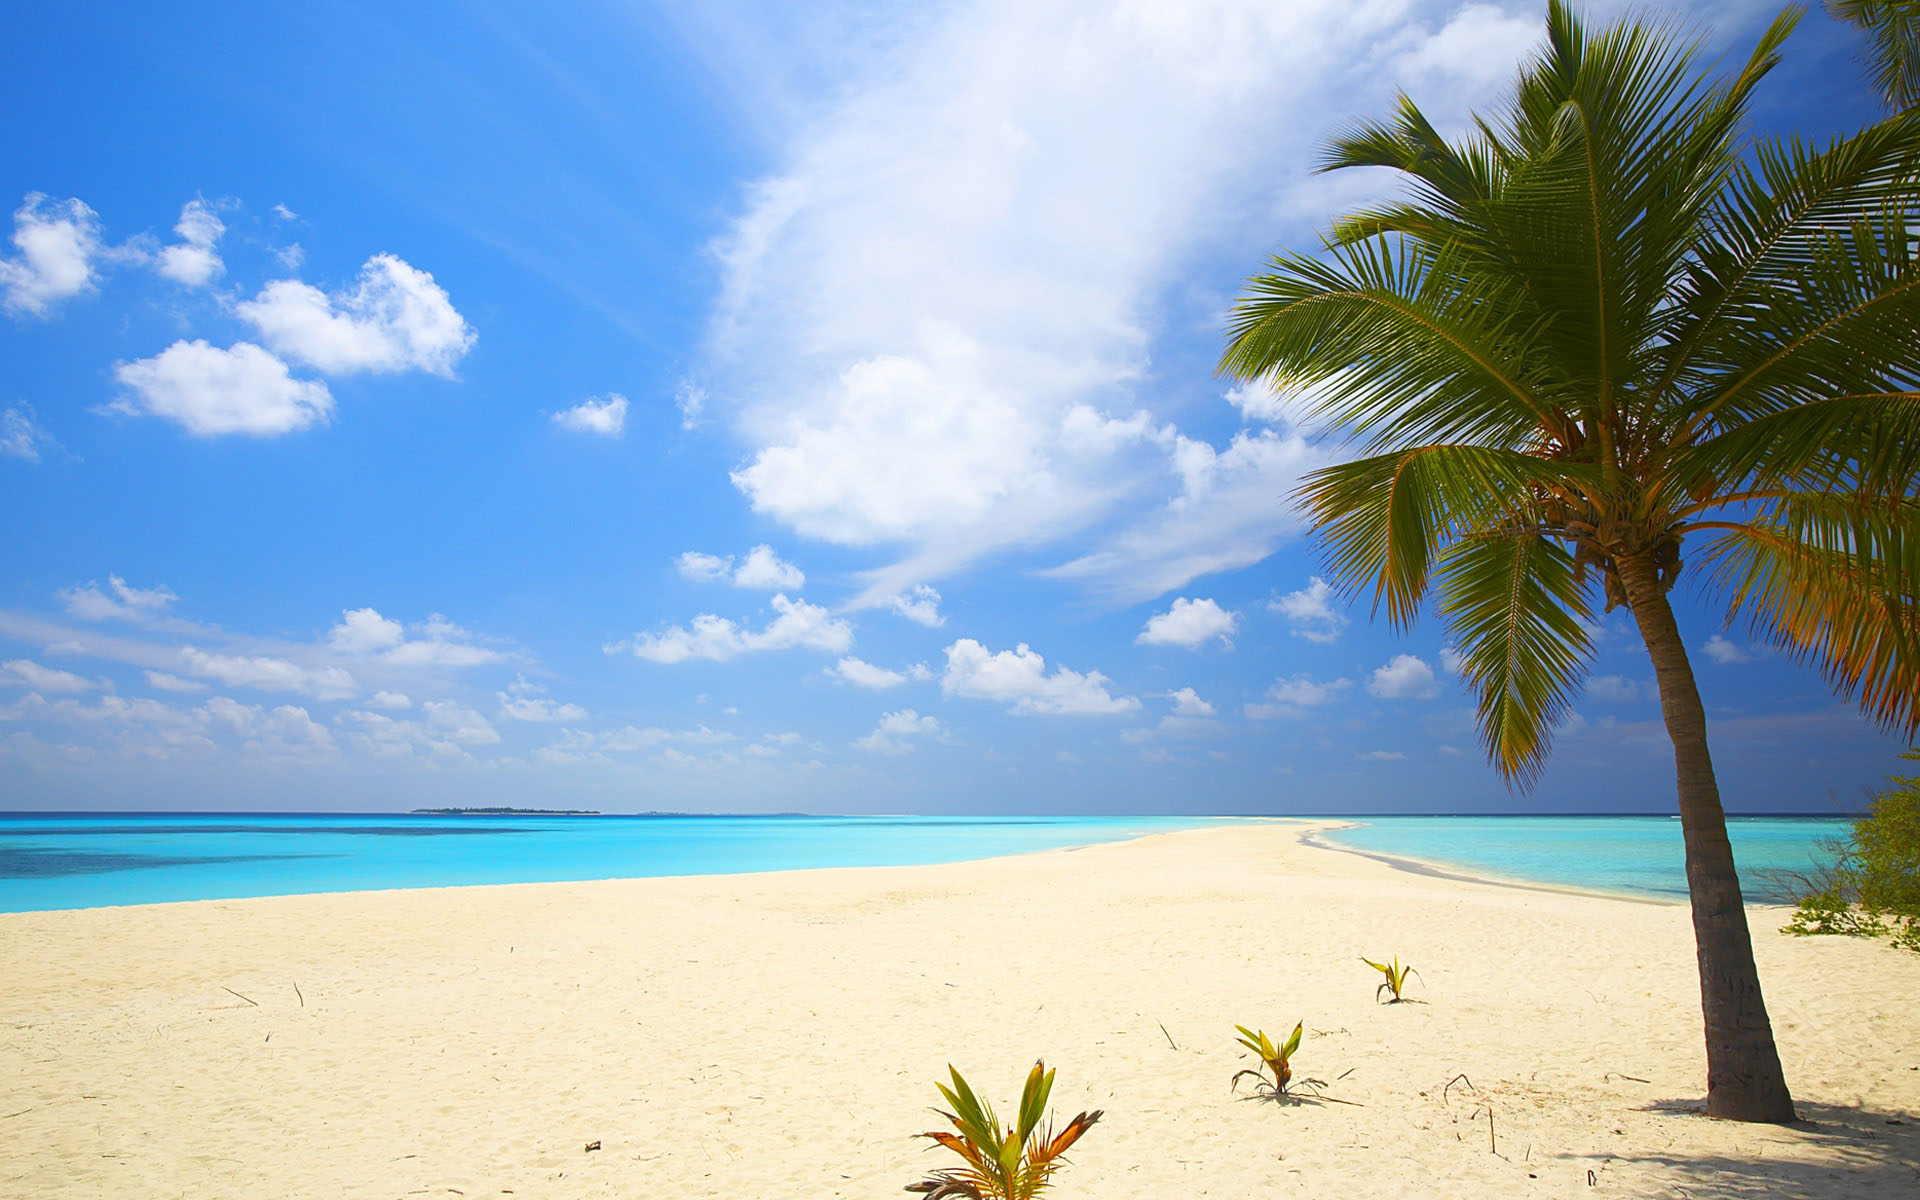 Goa Beach Parallax Hd Iphone Ipad Wallpaper: Apple Beach Wallpaper